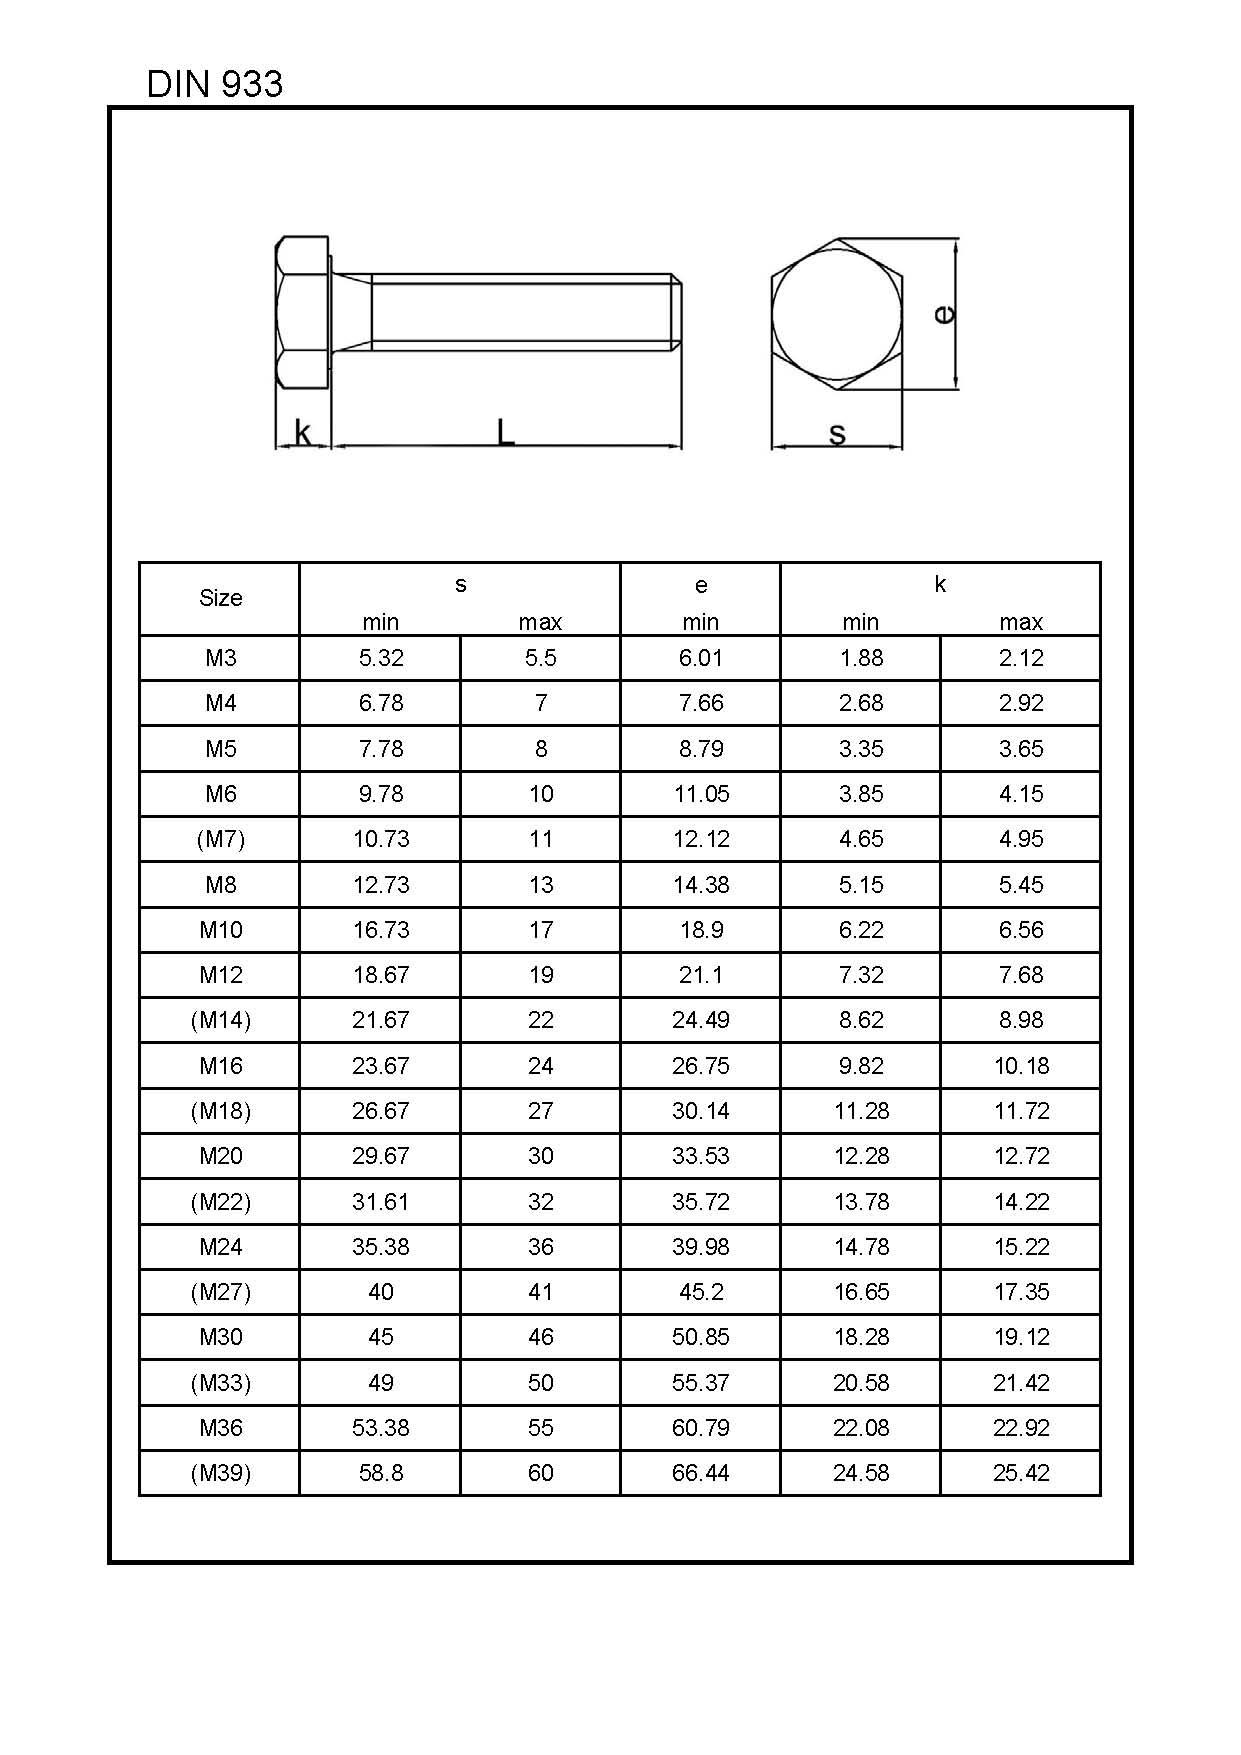 DIN 933-L&W Fasteners Company